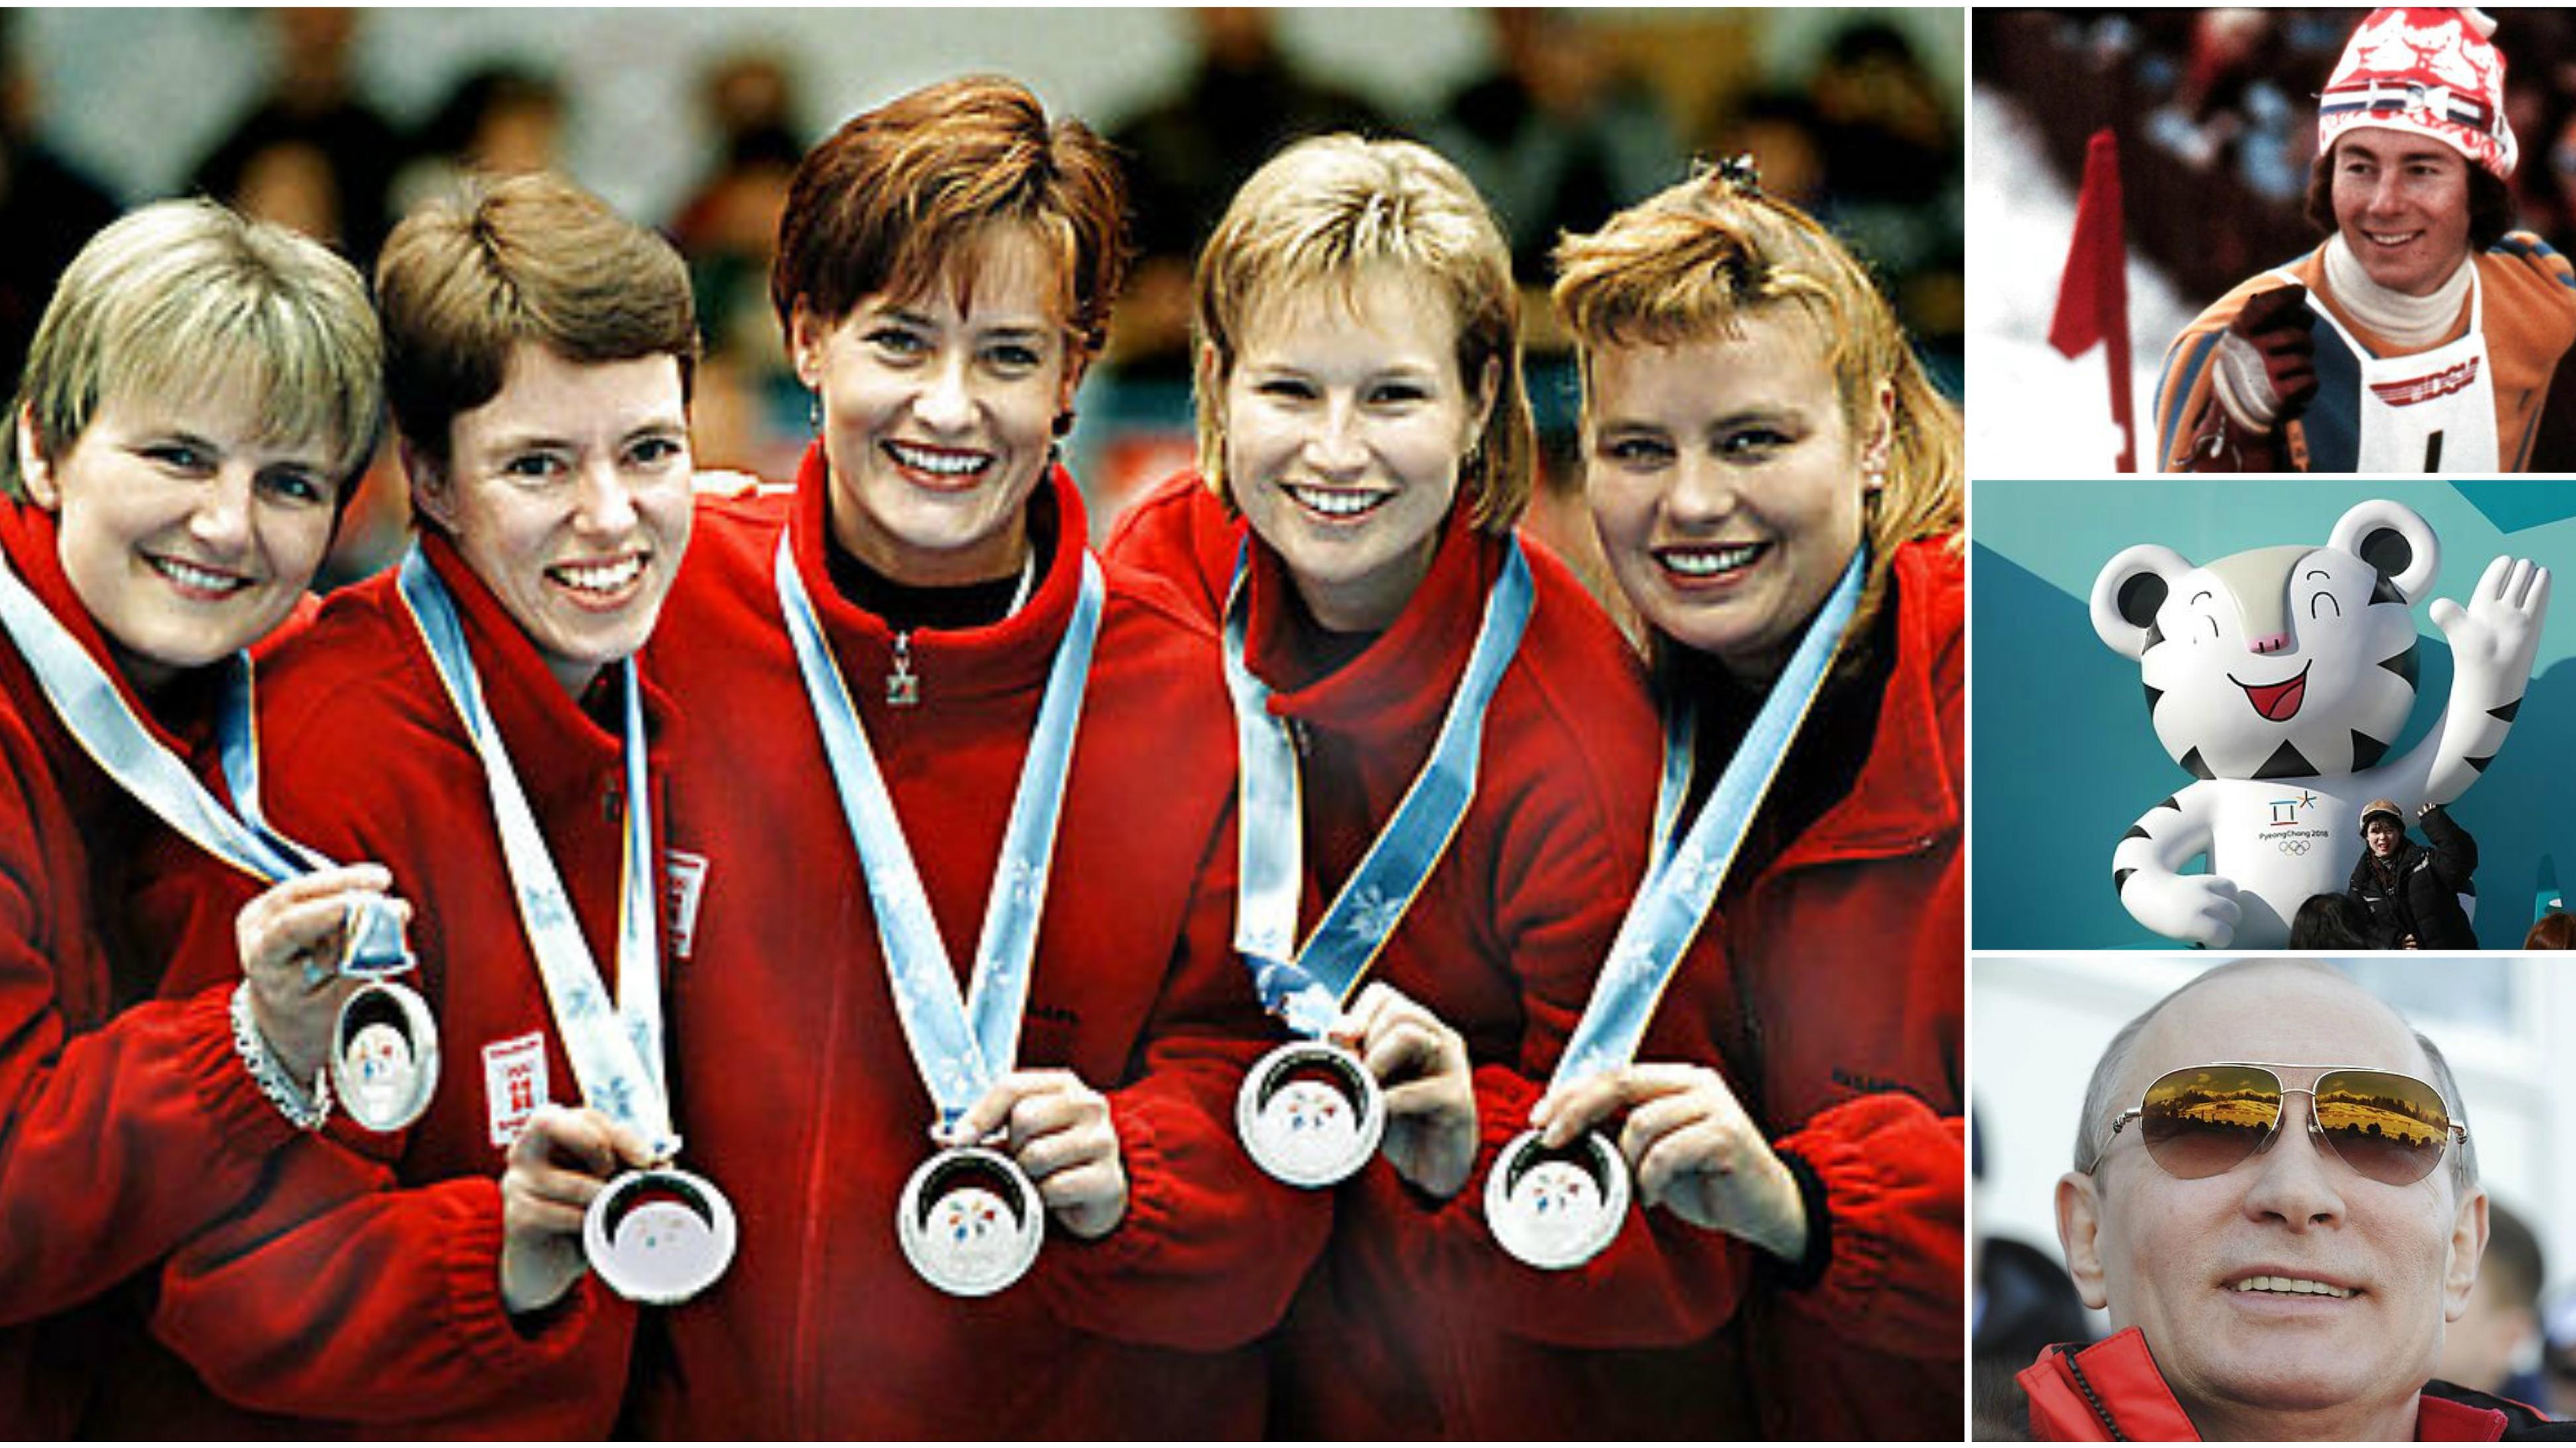 flest ol guldmedaljer